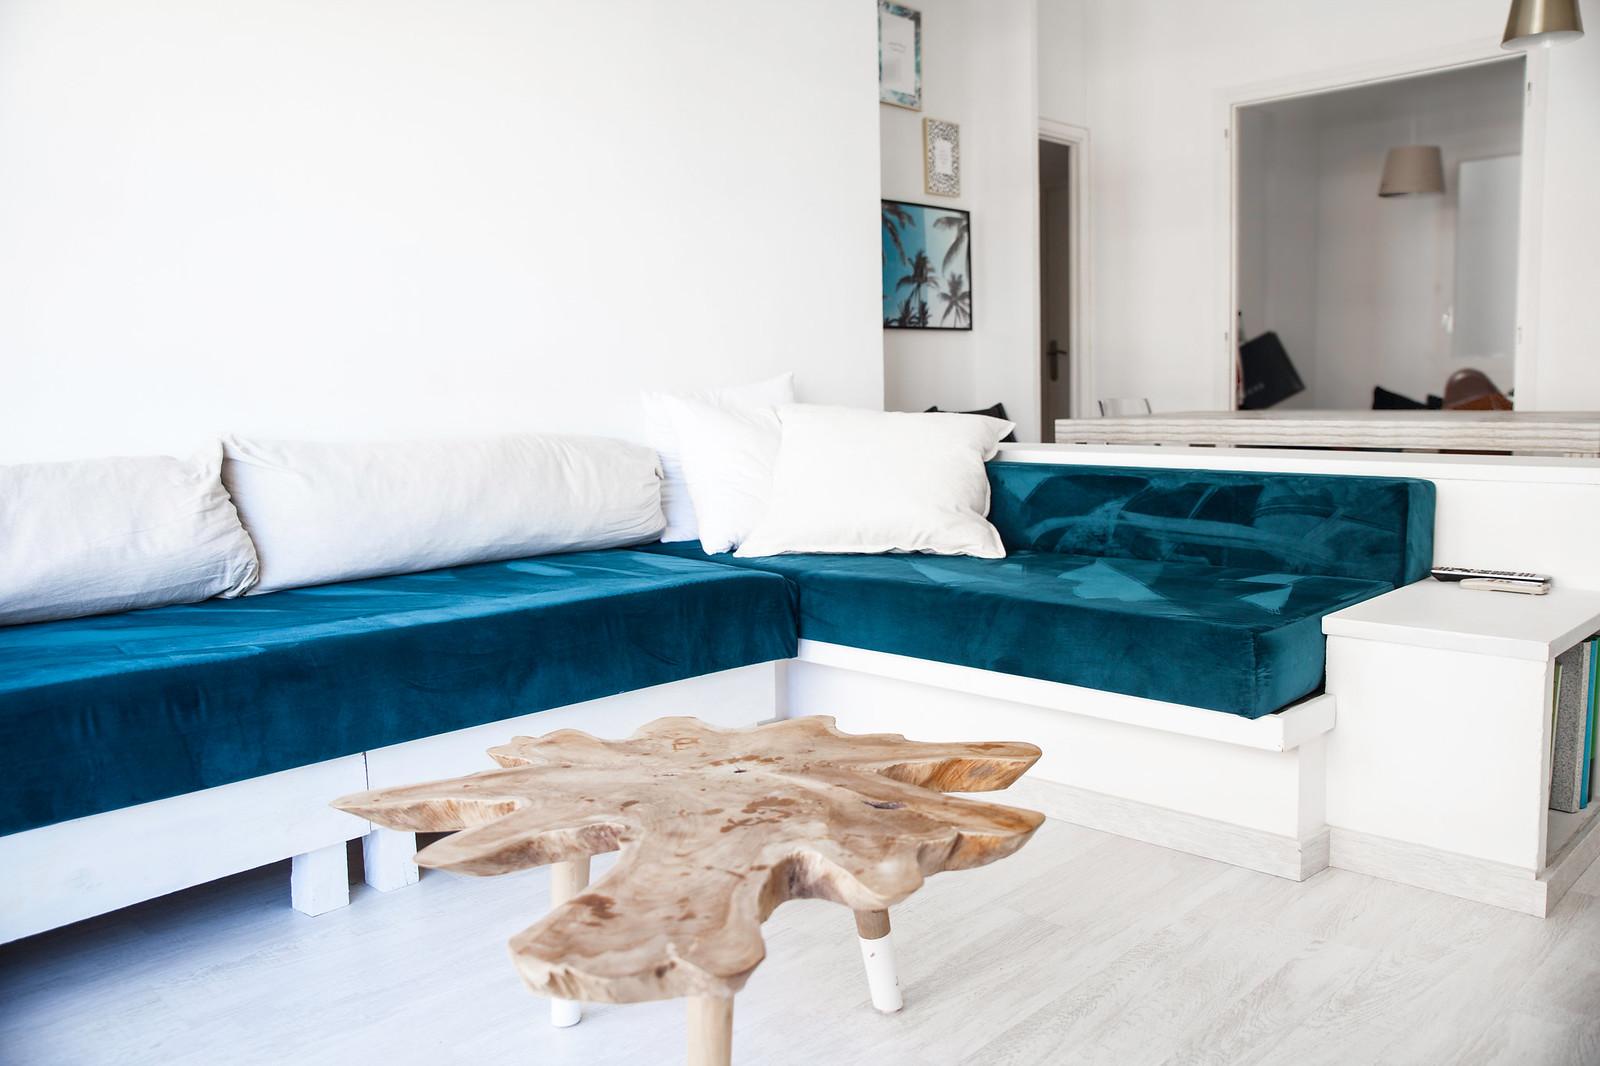 02_5_consejos_para_conseguir_decoracion_estilo_nordico_parquet_barcelona_buen_precio_deco_inspo_influencer_barcelona_theguestgirl_aloha_home